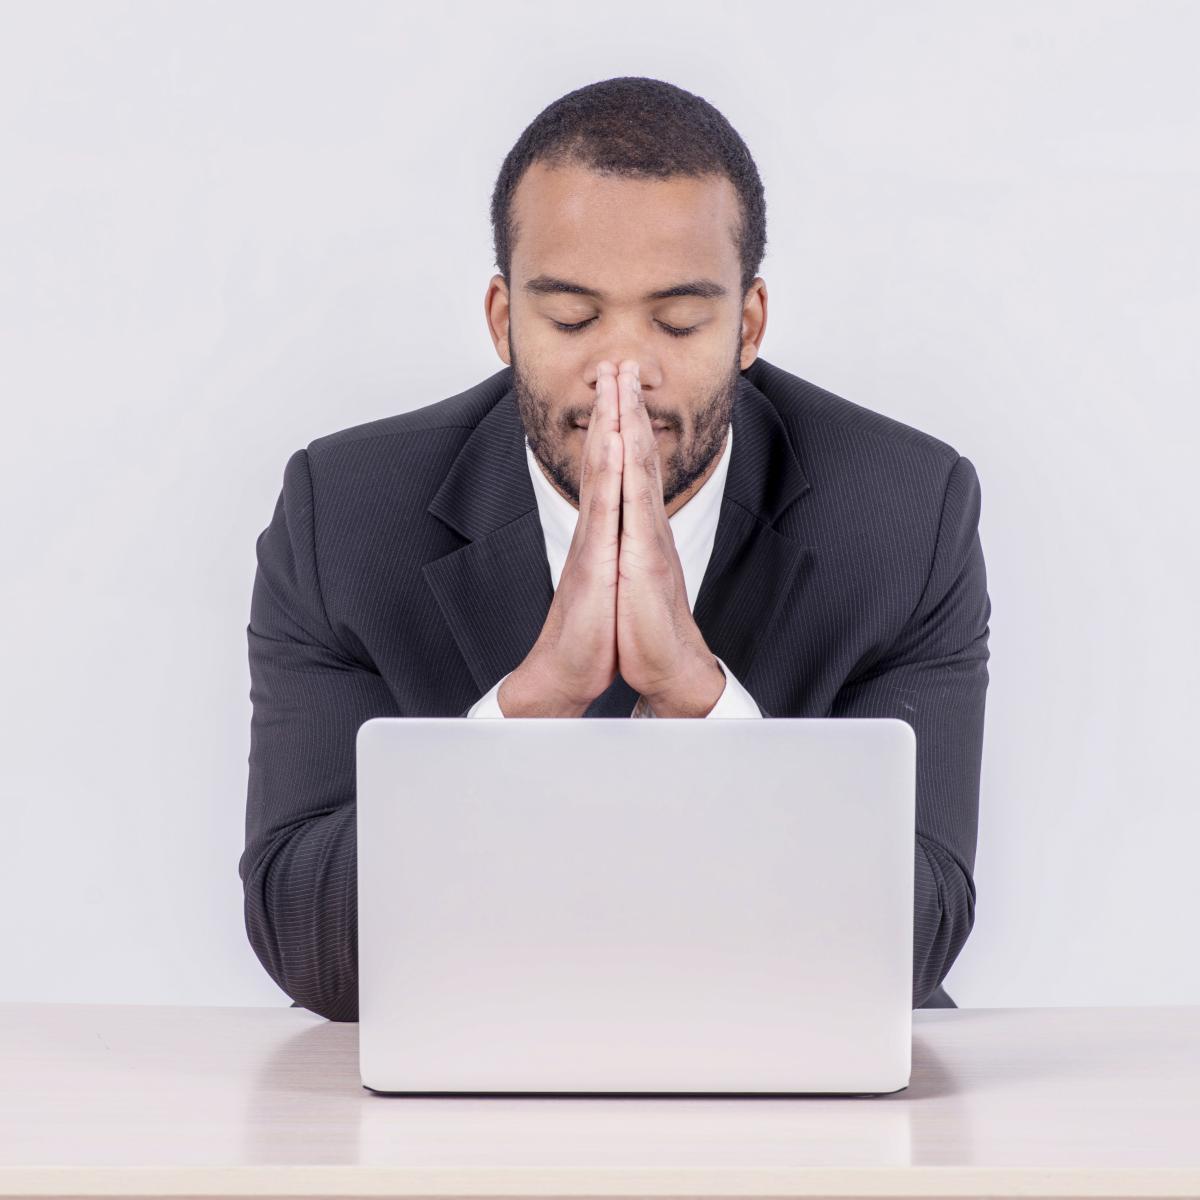 Prayer-at-work l6sqBL